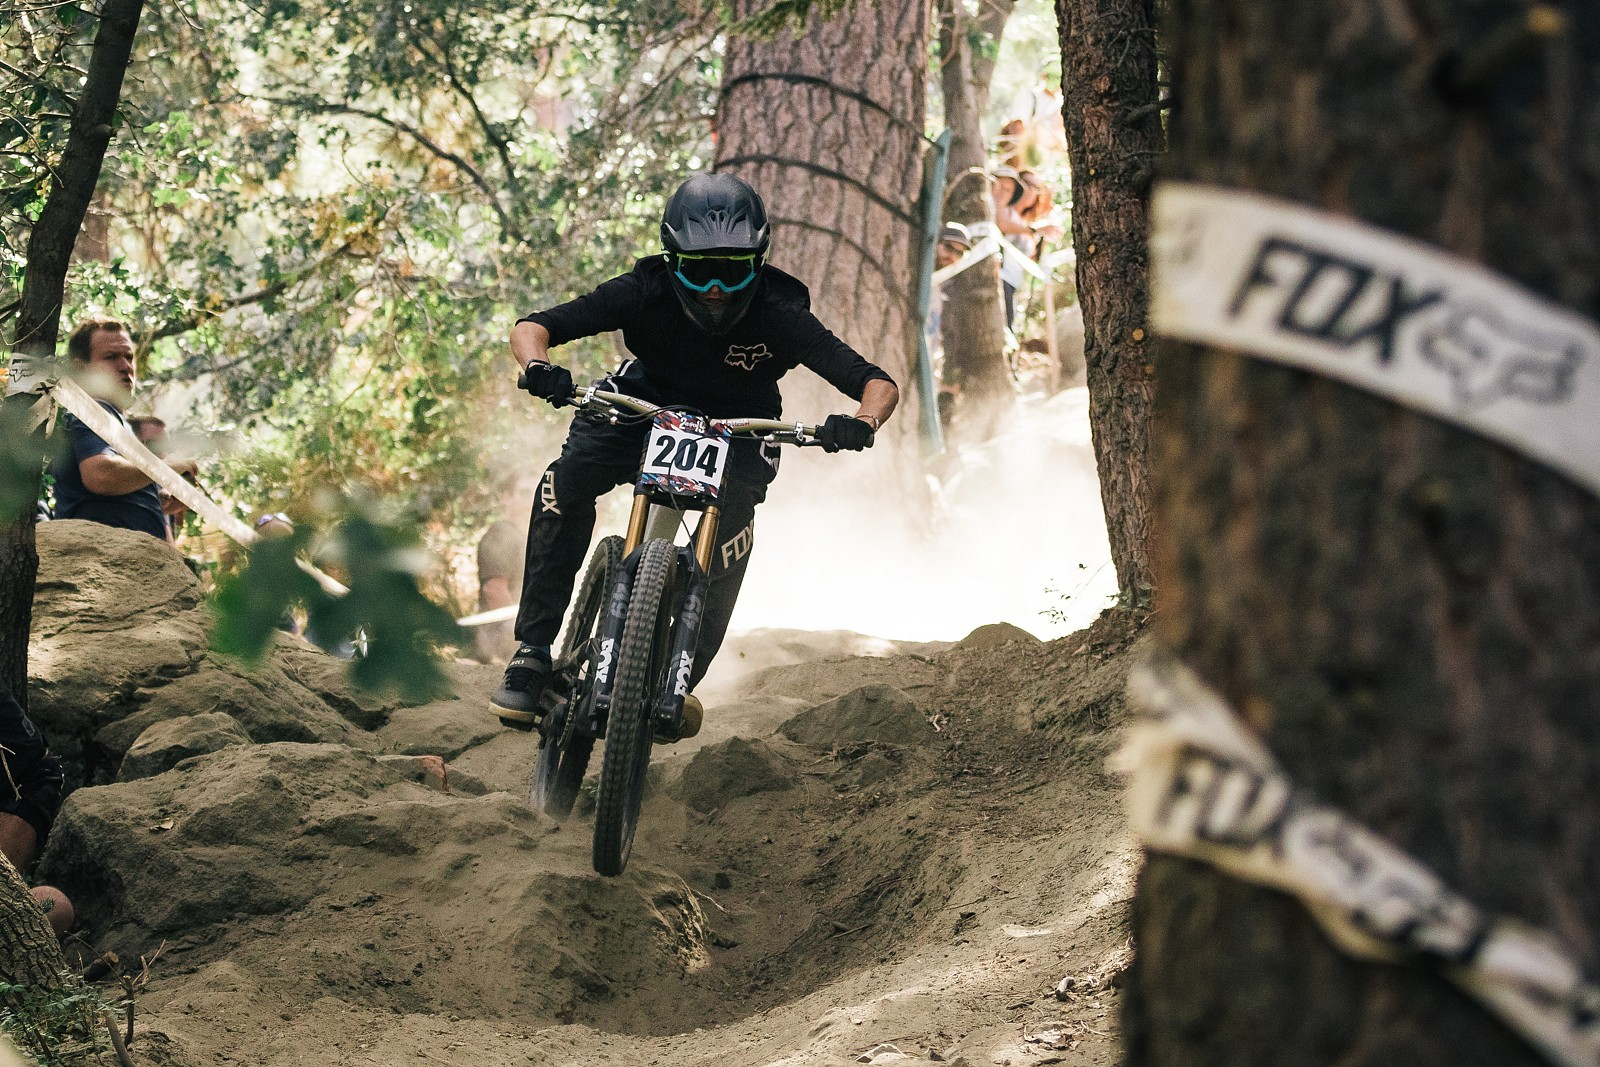 2019USOpenMTB DH yellow-22 - ALeedomPhotography - Mountain Biking Pictures - Vital MTB